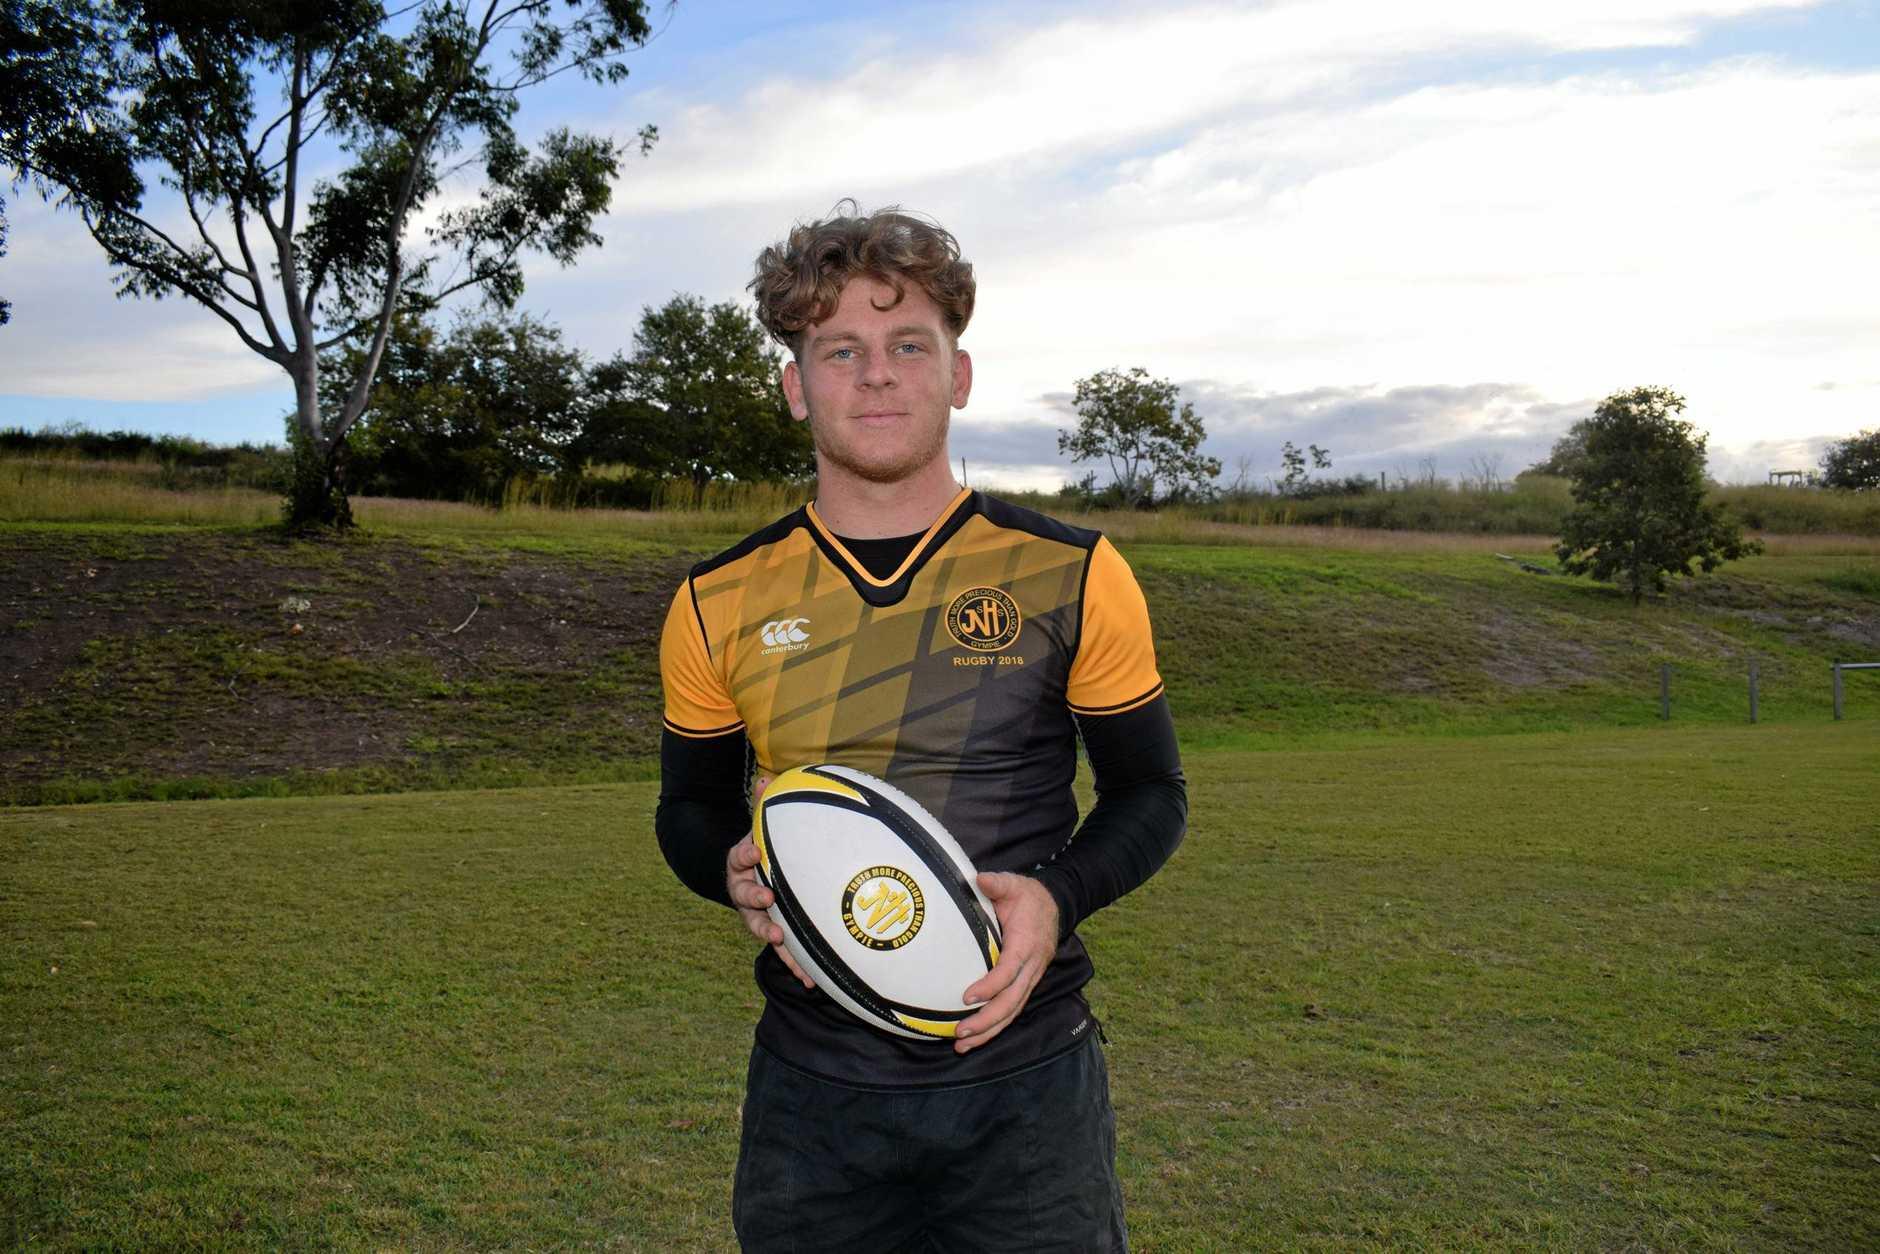 Gympie school rugby - Brae McAllister, 17.